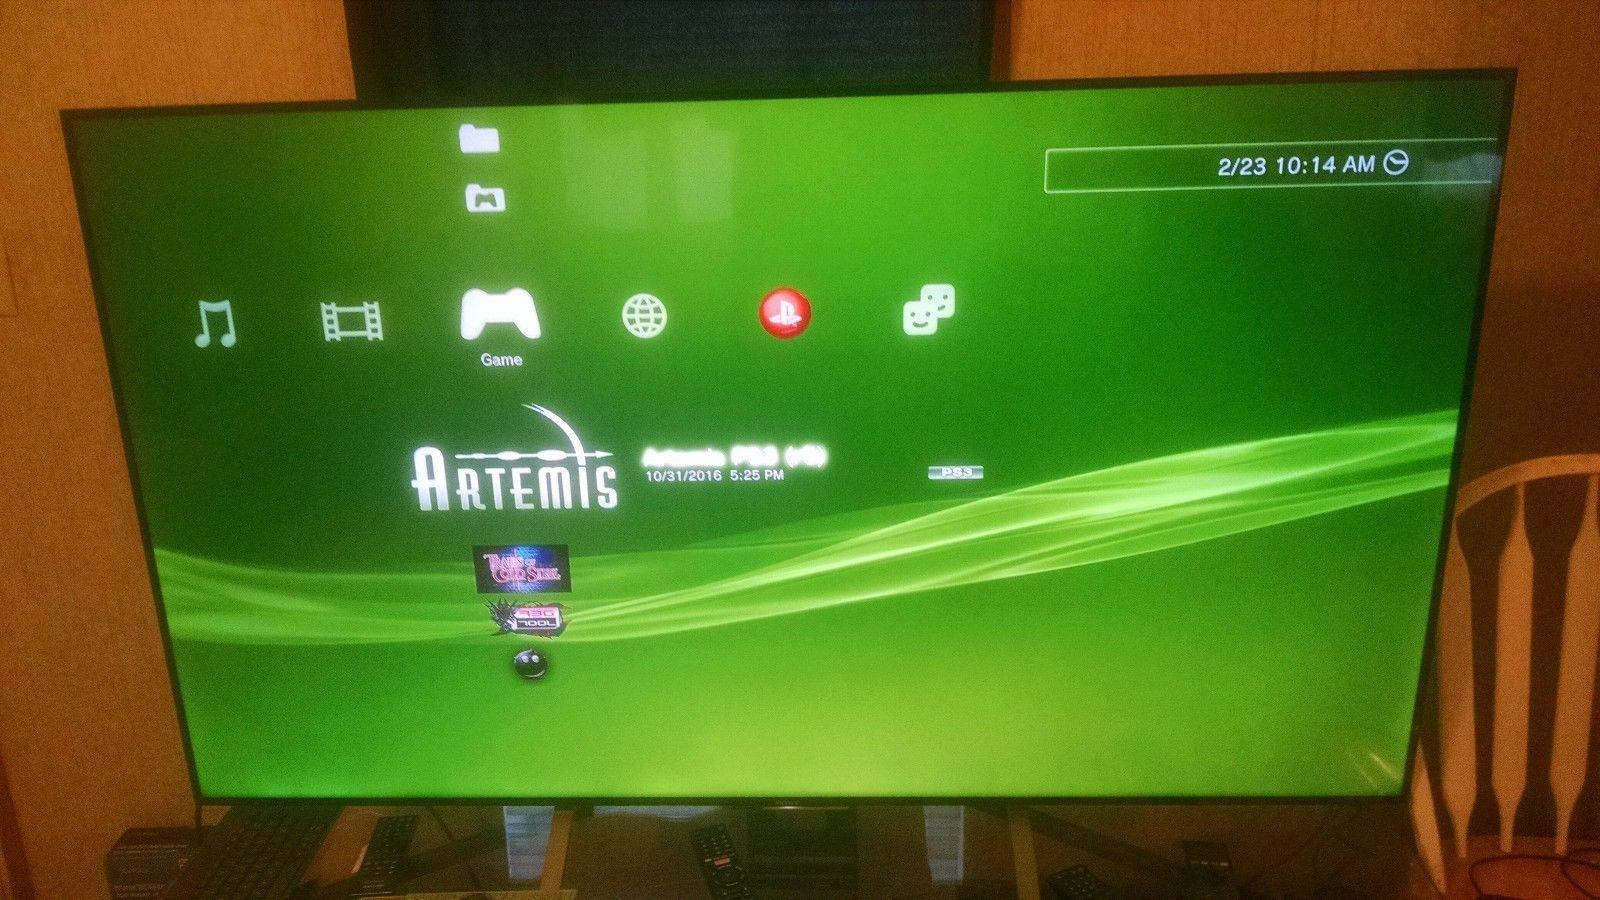 PS3 Backward Compatible Console 60GB Model and 50 similar items